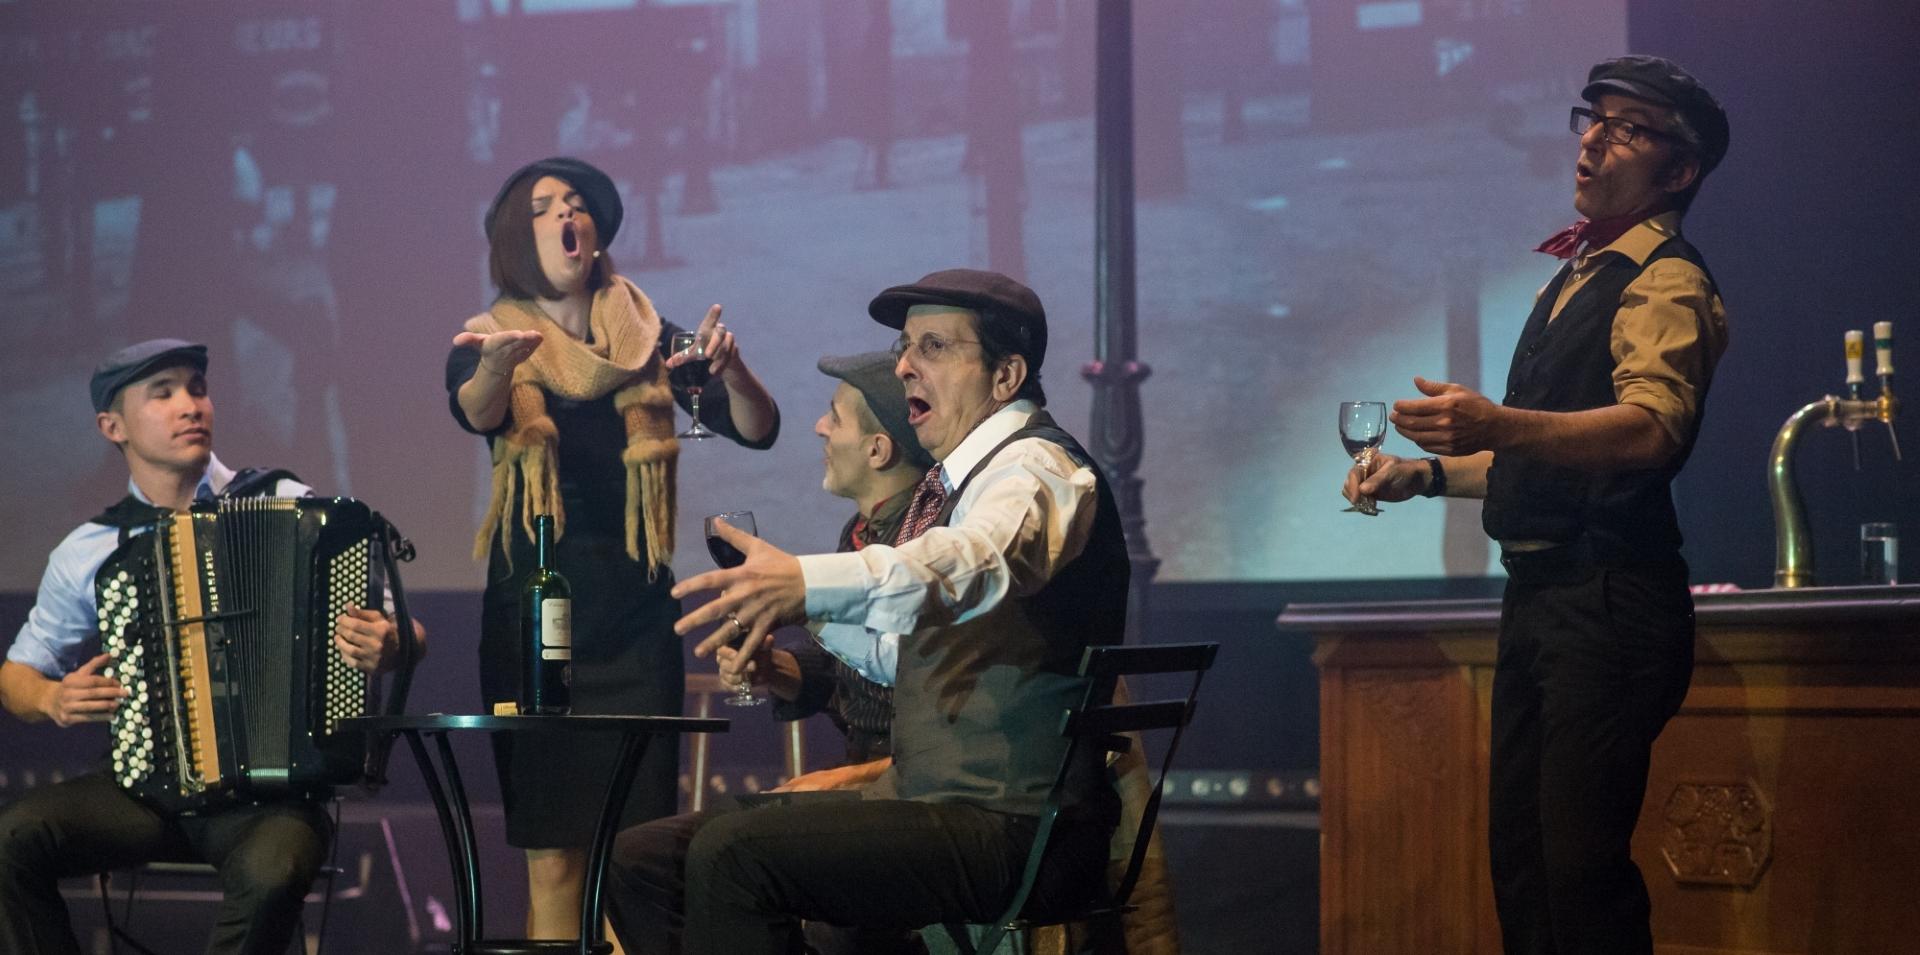 KD LISINSKI Veliki glazbeno-scenski spektakl u čast Edith Piaf